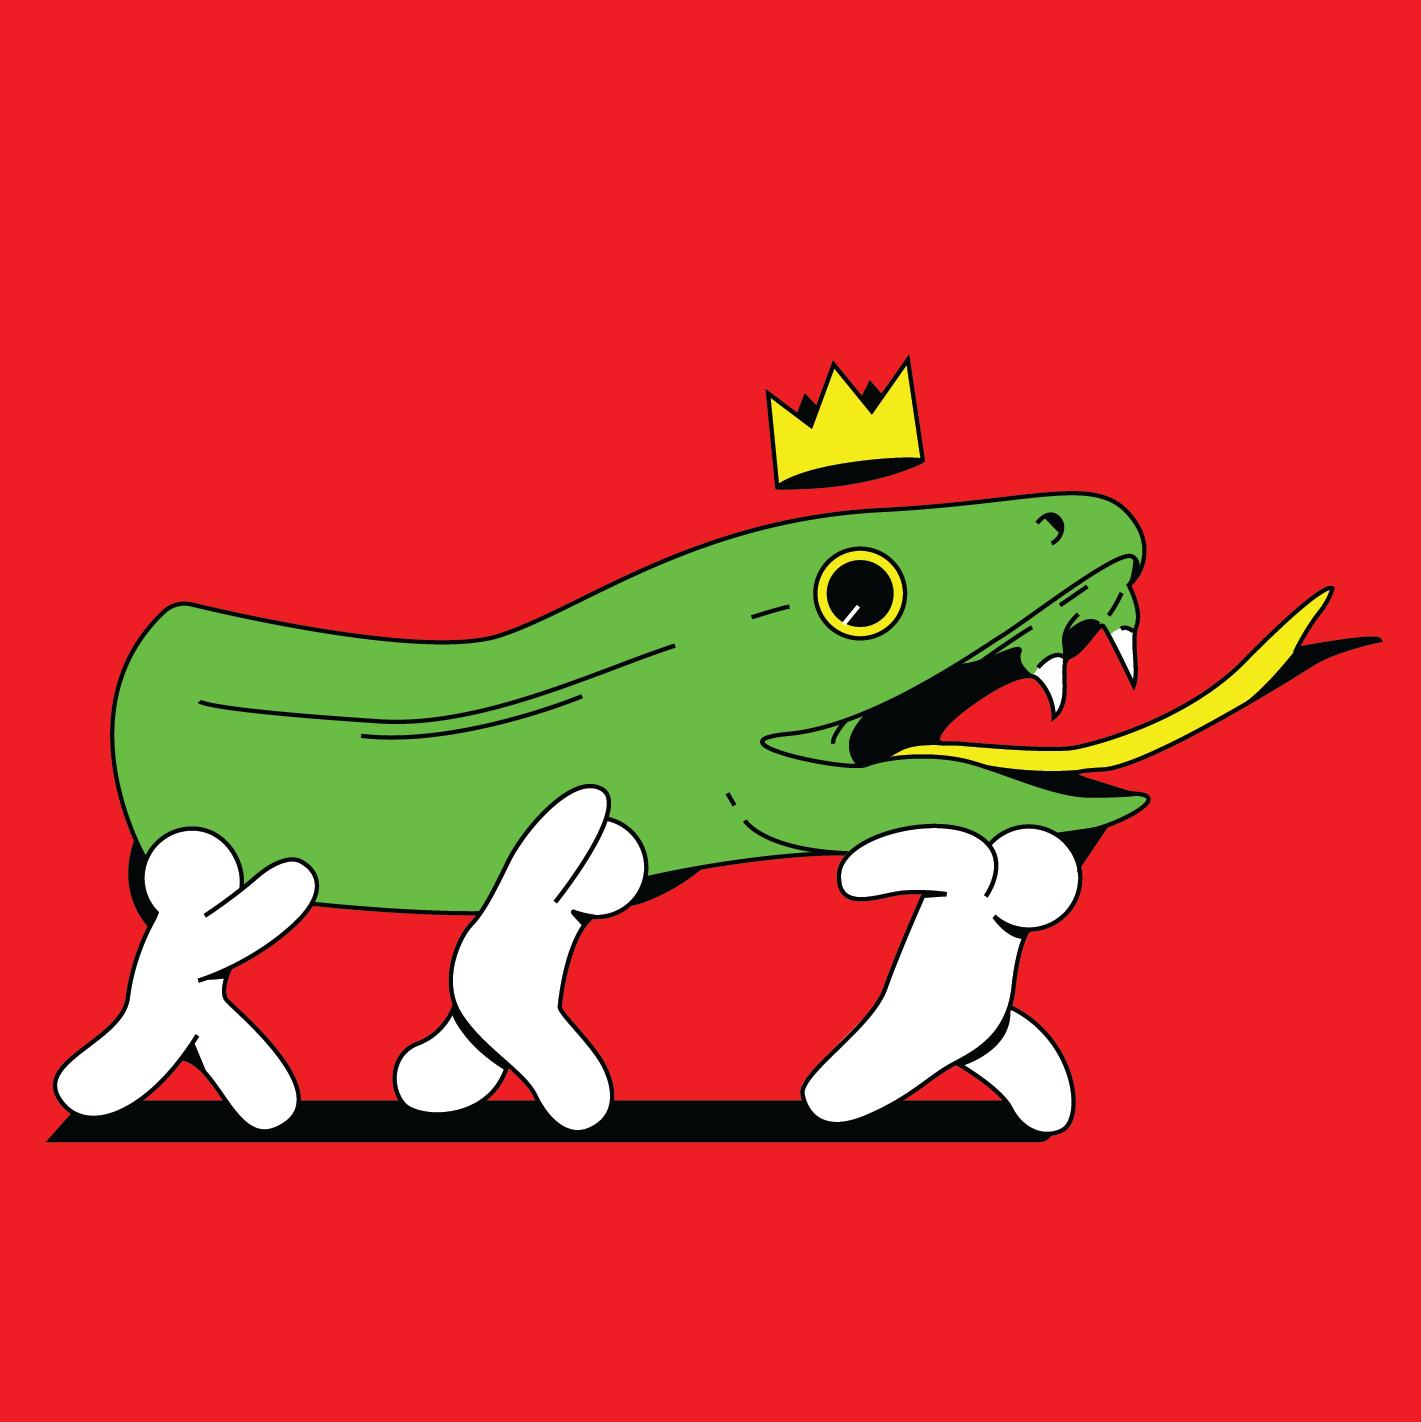 Carrier 3 - The Serpent